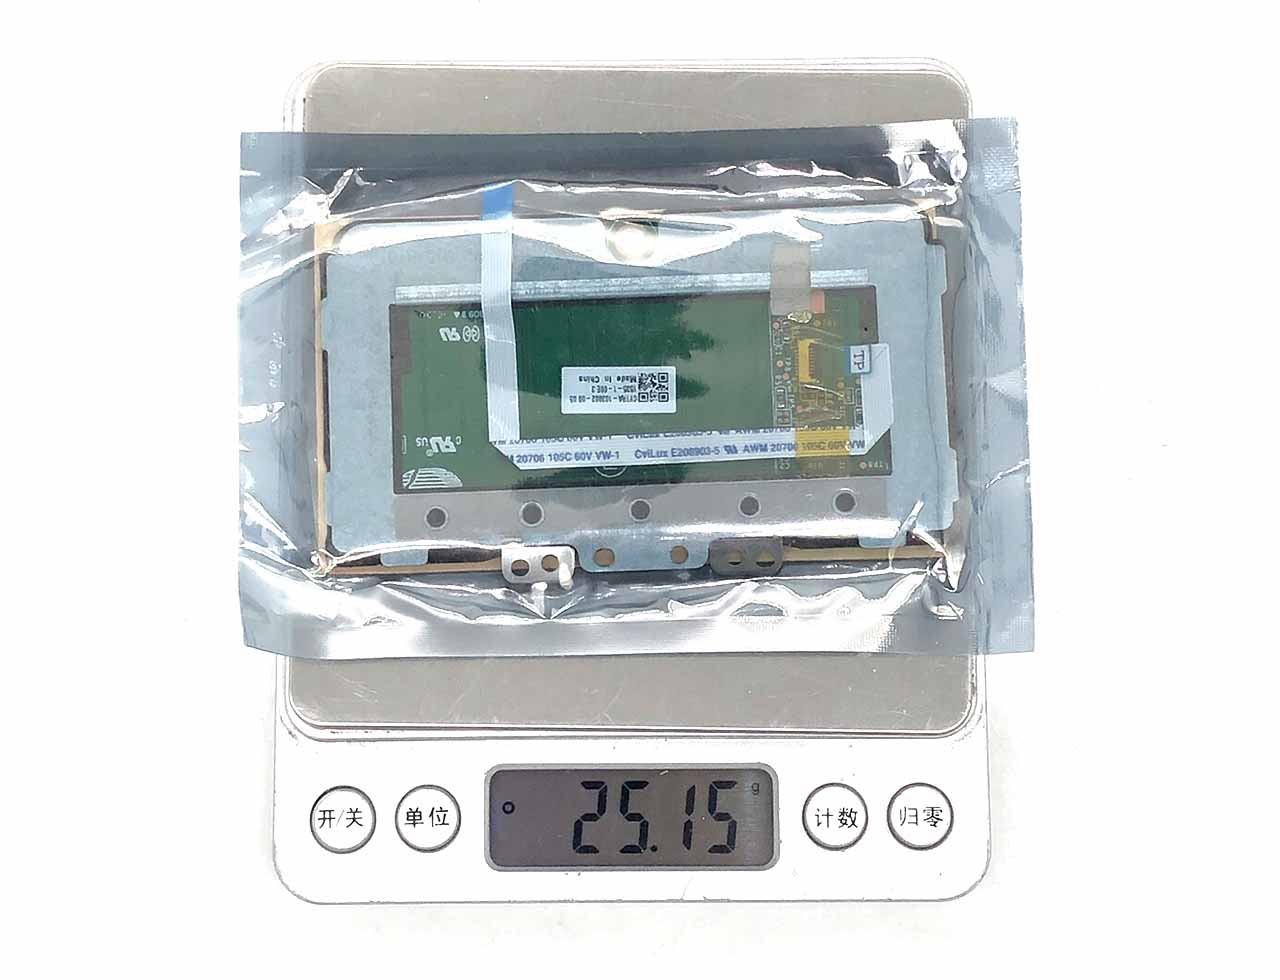 宏基触摸鼠标板AM0R0000300 CYTRA-103002-00 60.SH7N2.002 AM0R000C300 920-002345-01 RevA TM-002292-001 56. M91N 1.001